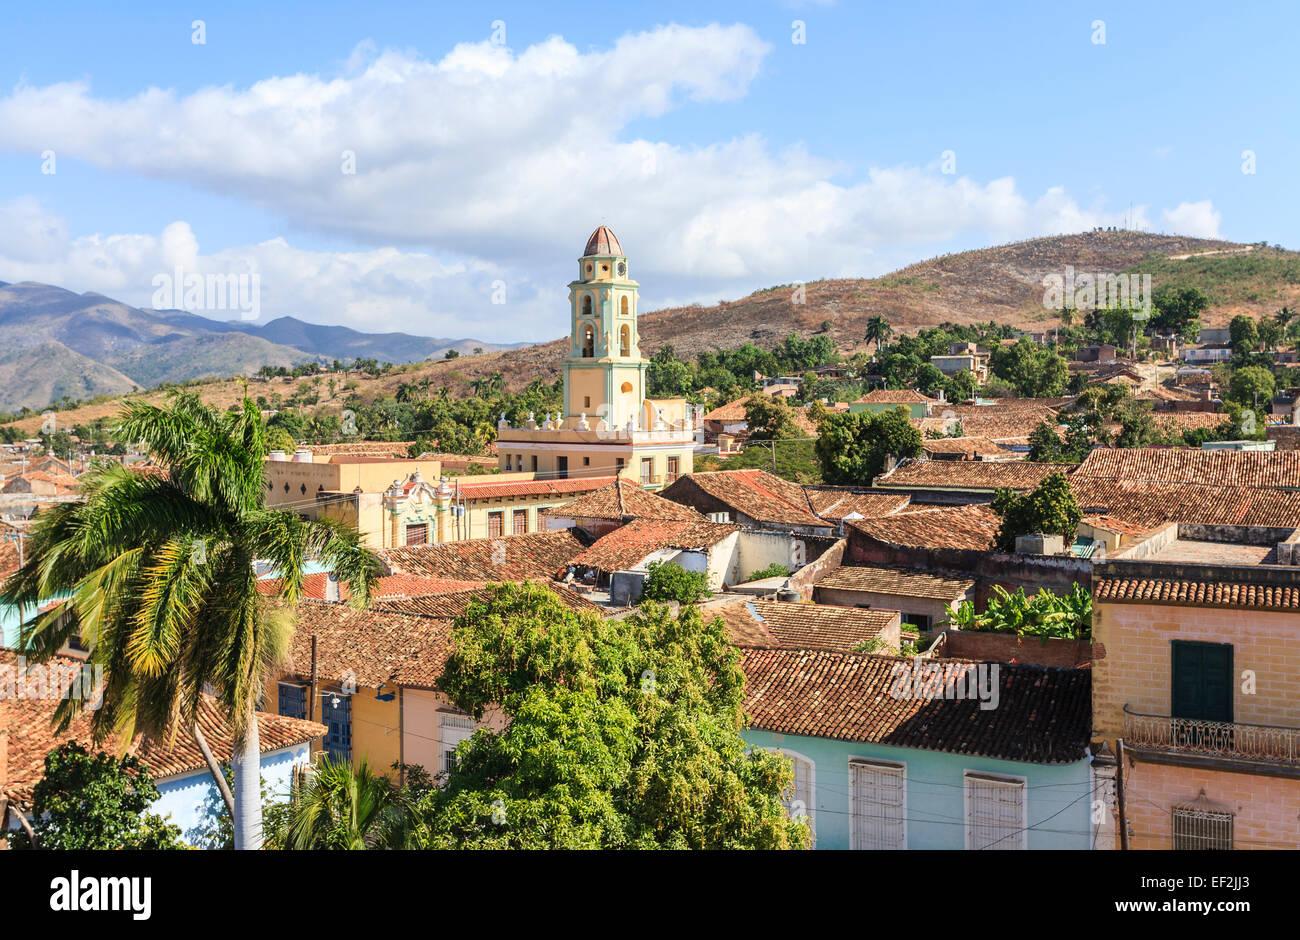 Panoramic landscape: terracotta tiled rooftop view over Trinidad, Cuba with Iglesia Parroquial de la Santísima - Stock Image